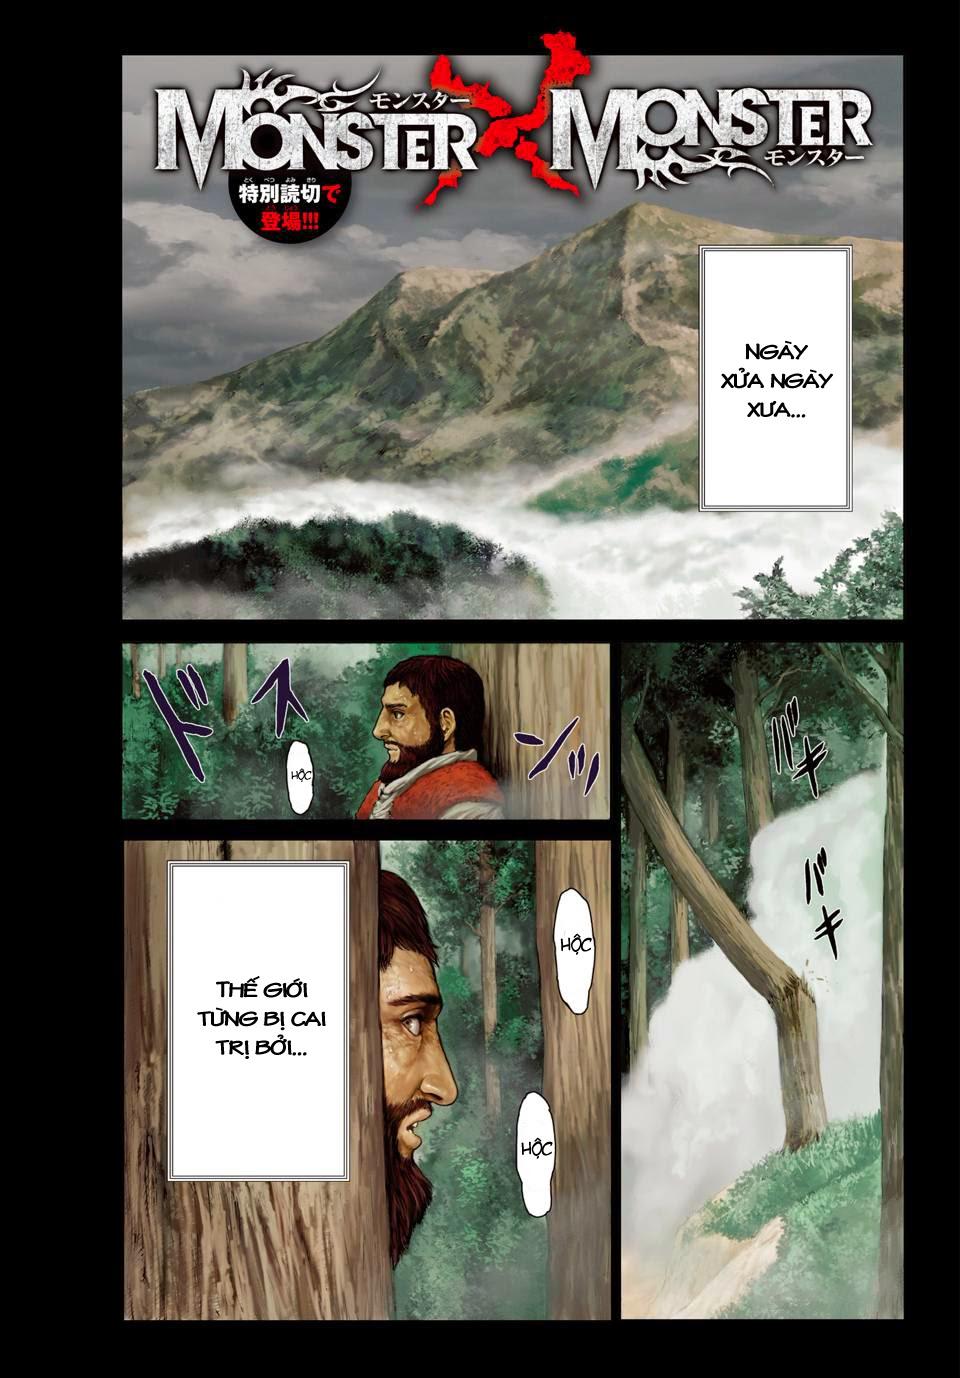 Monster X Monster chapter 1a trang 2